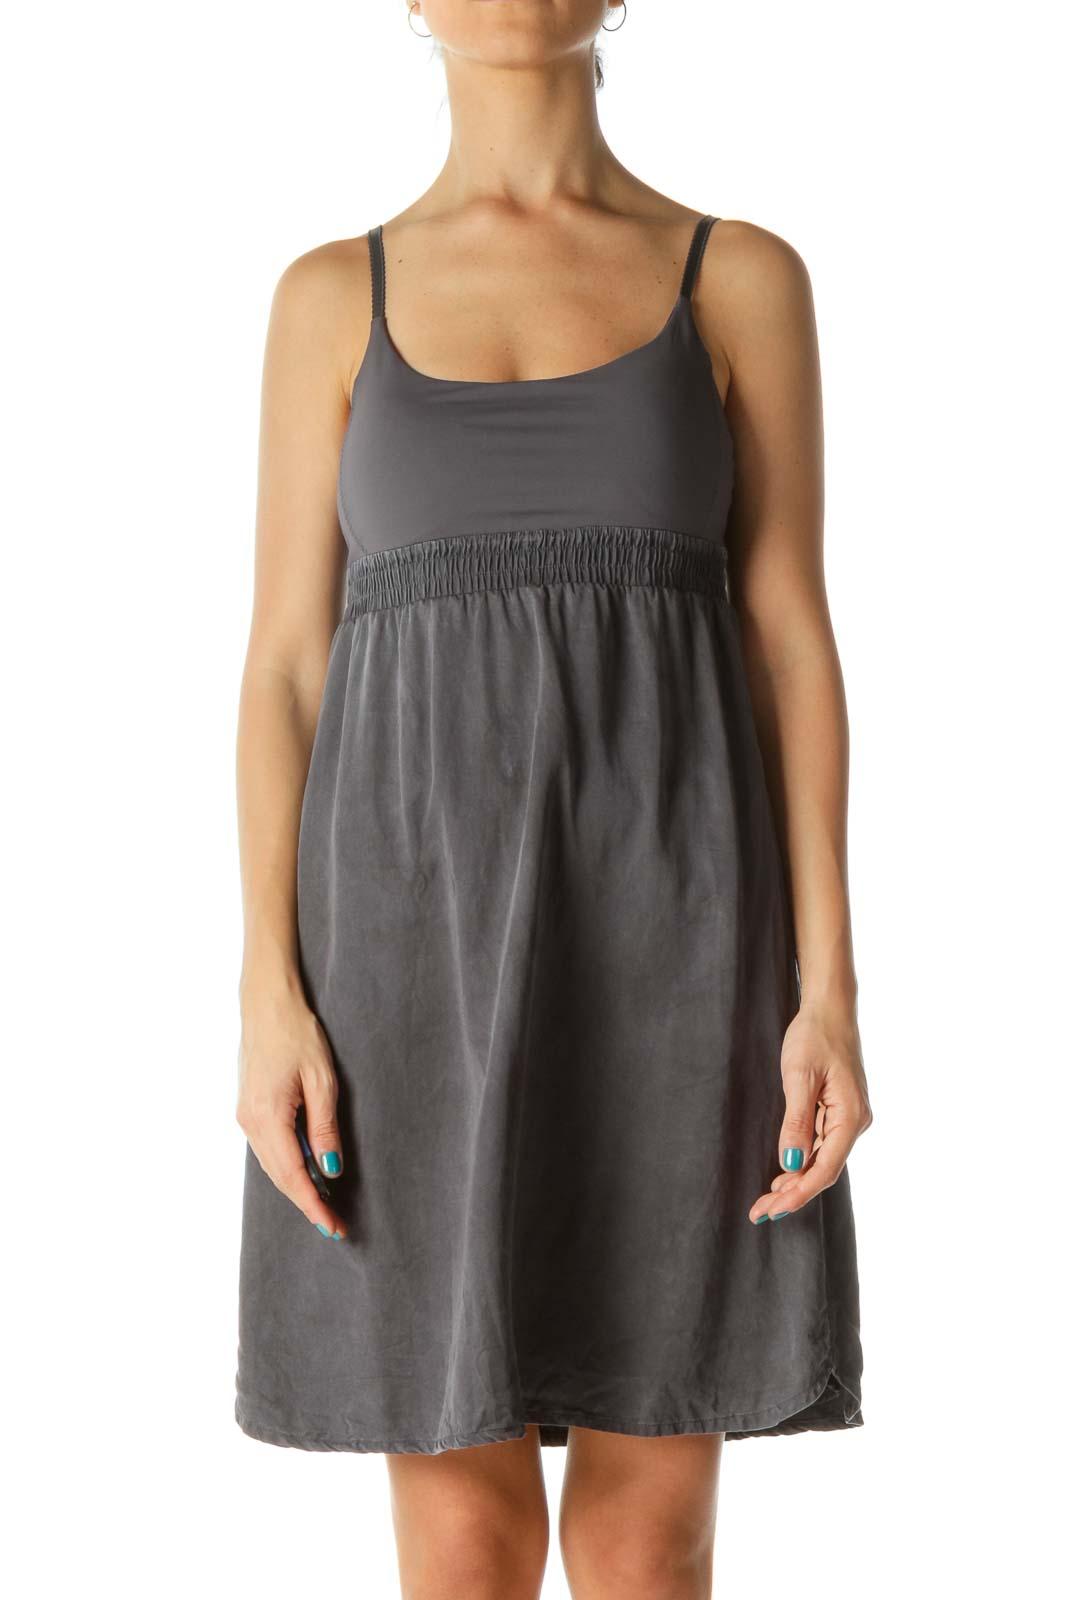 Gray Mixed Media Stretch Active Dress